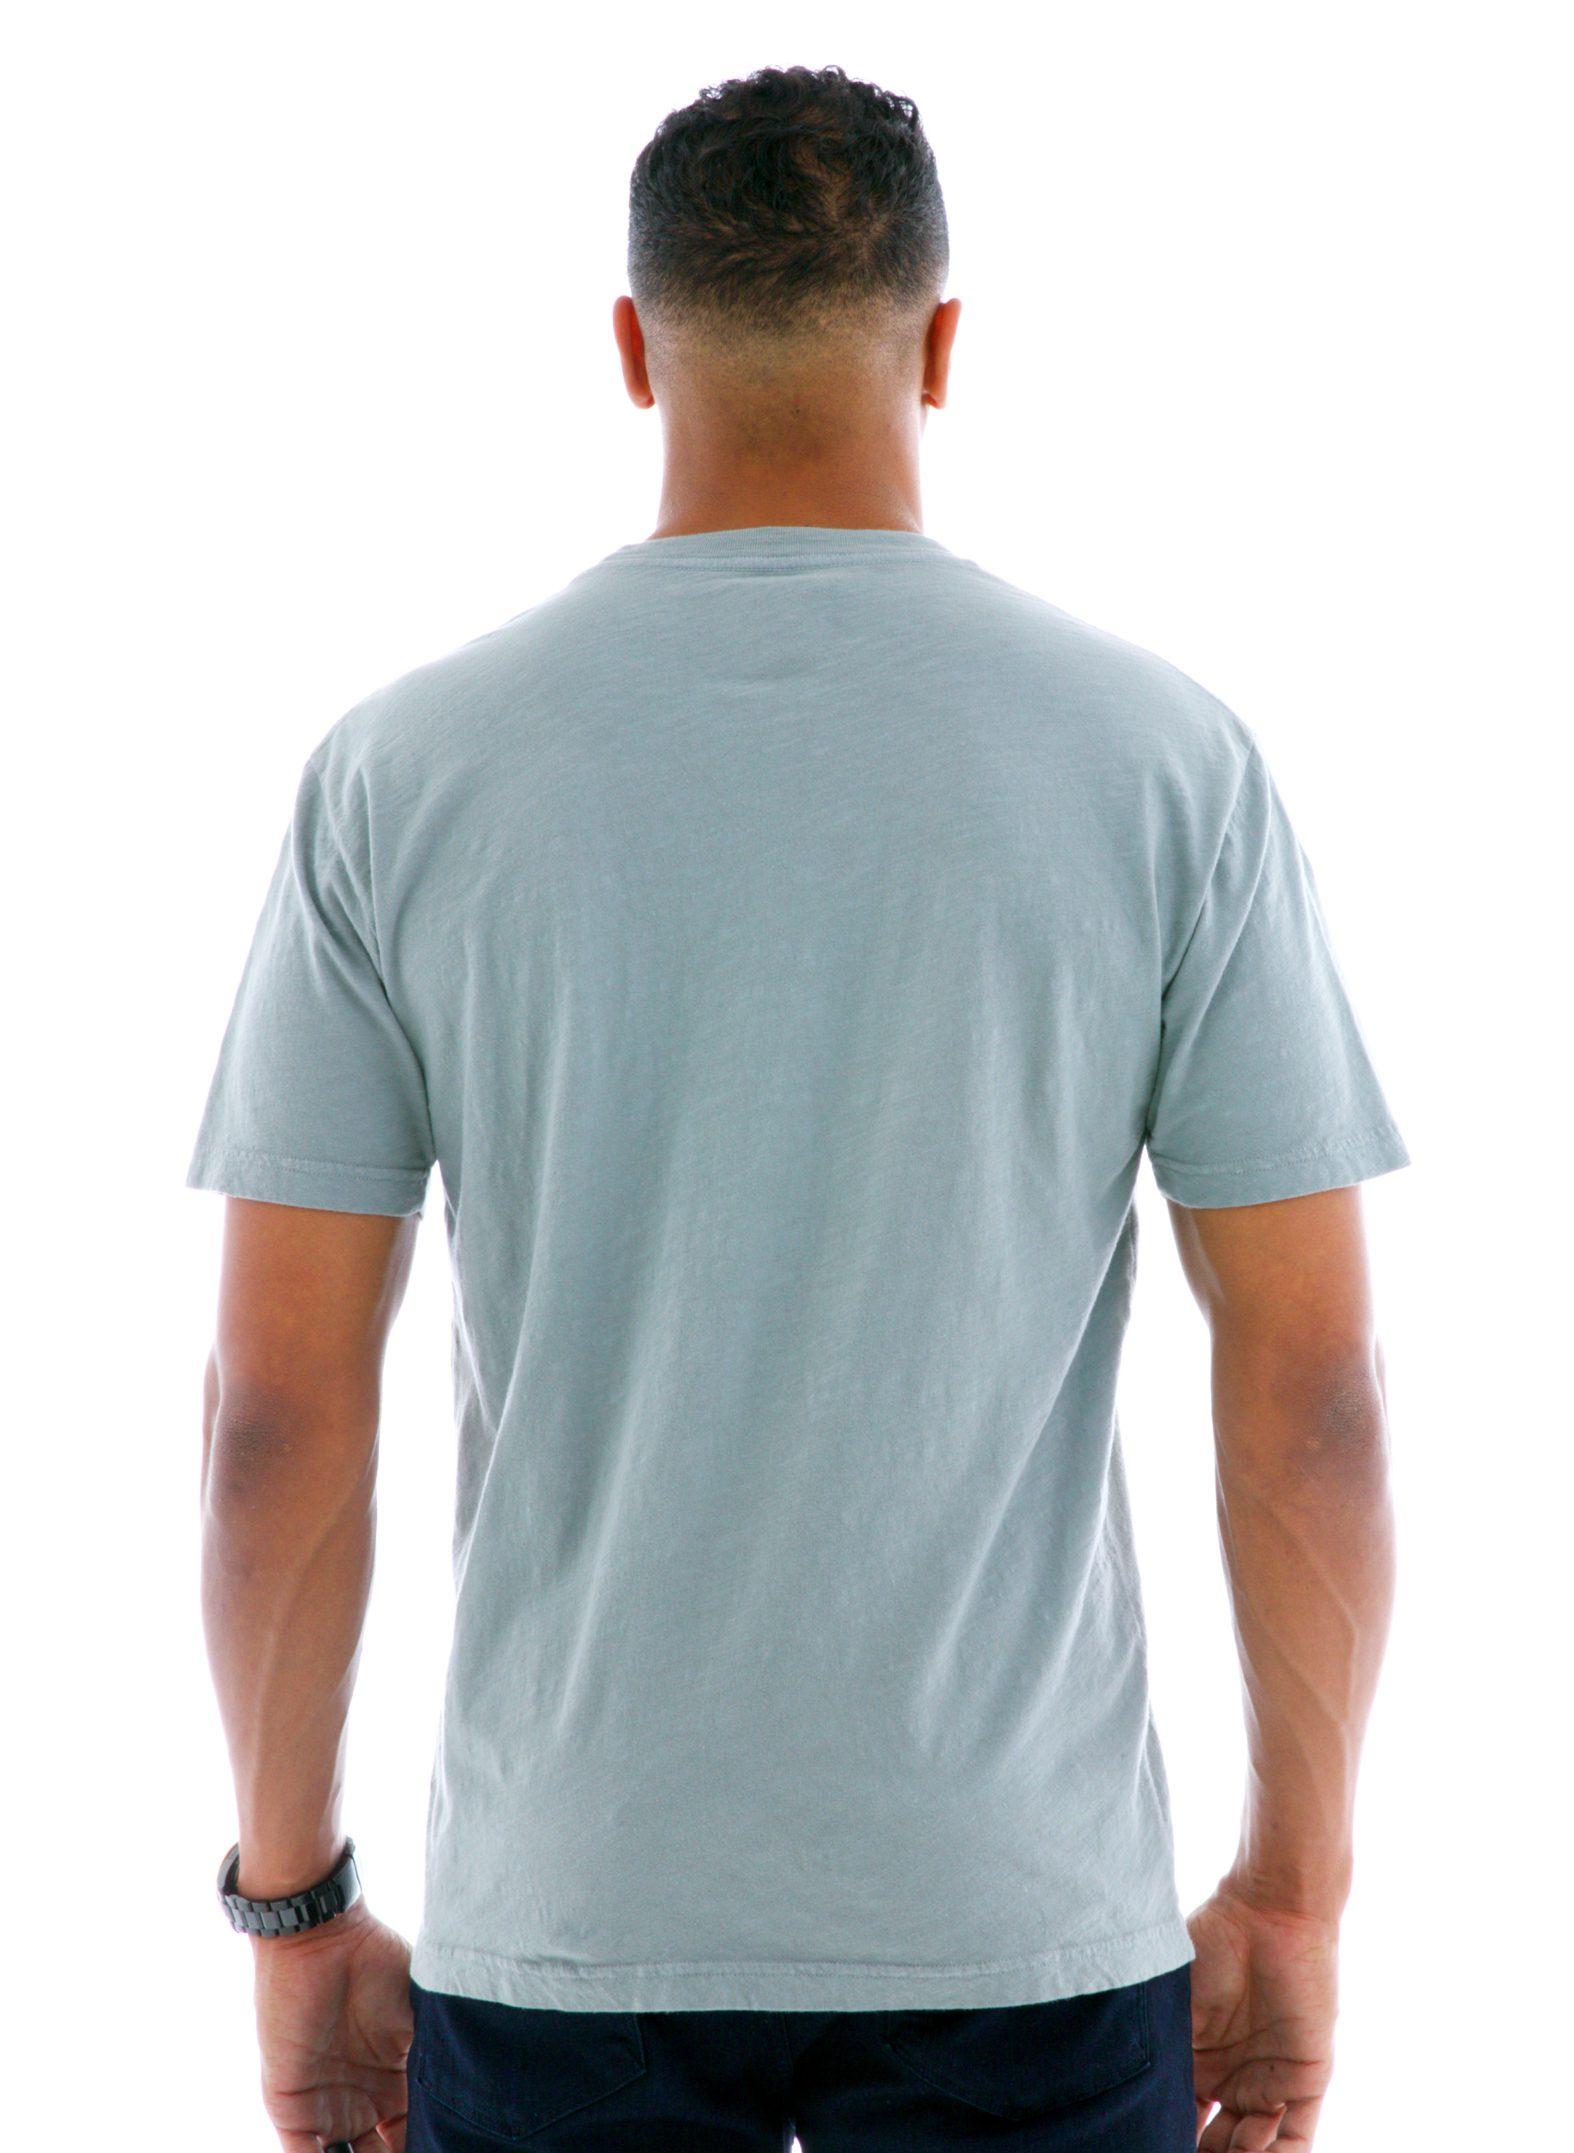 Premium Slub Jersey Custom Printed T-Shirt